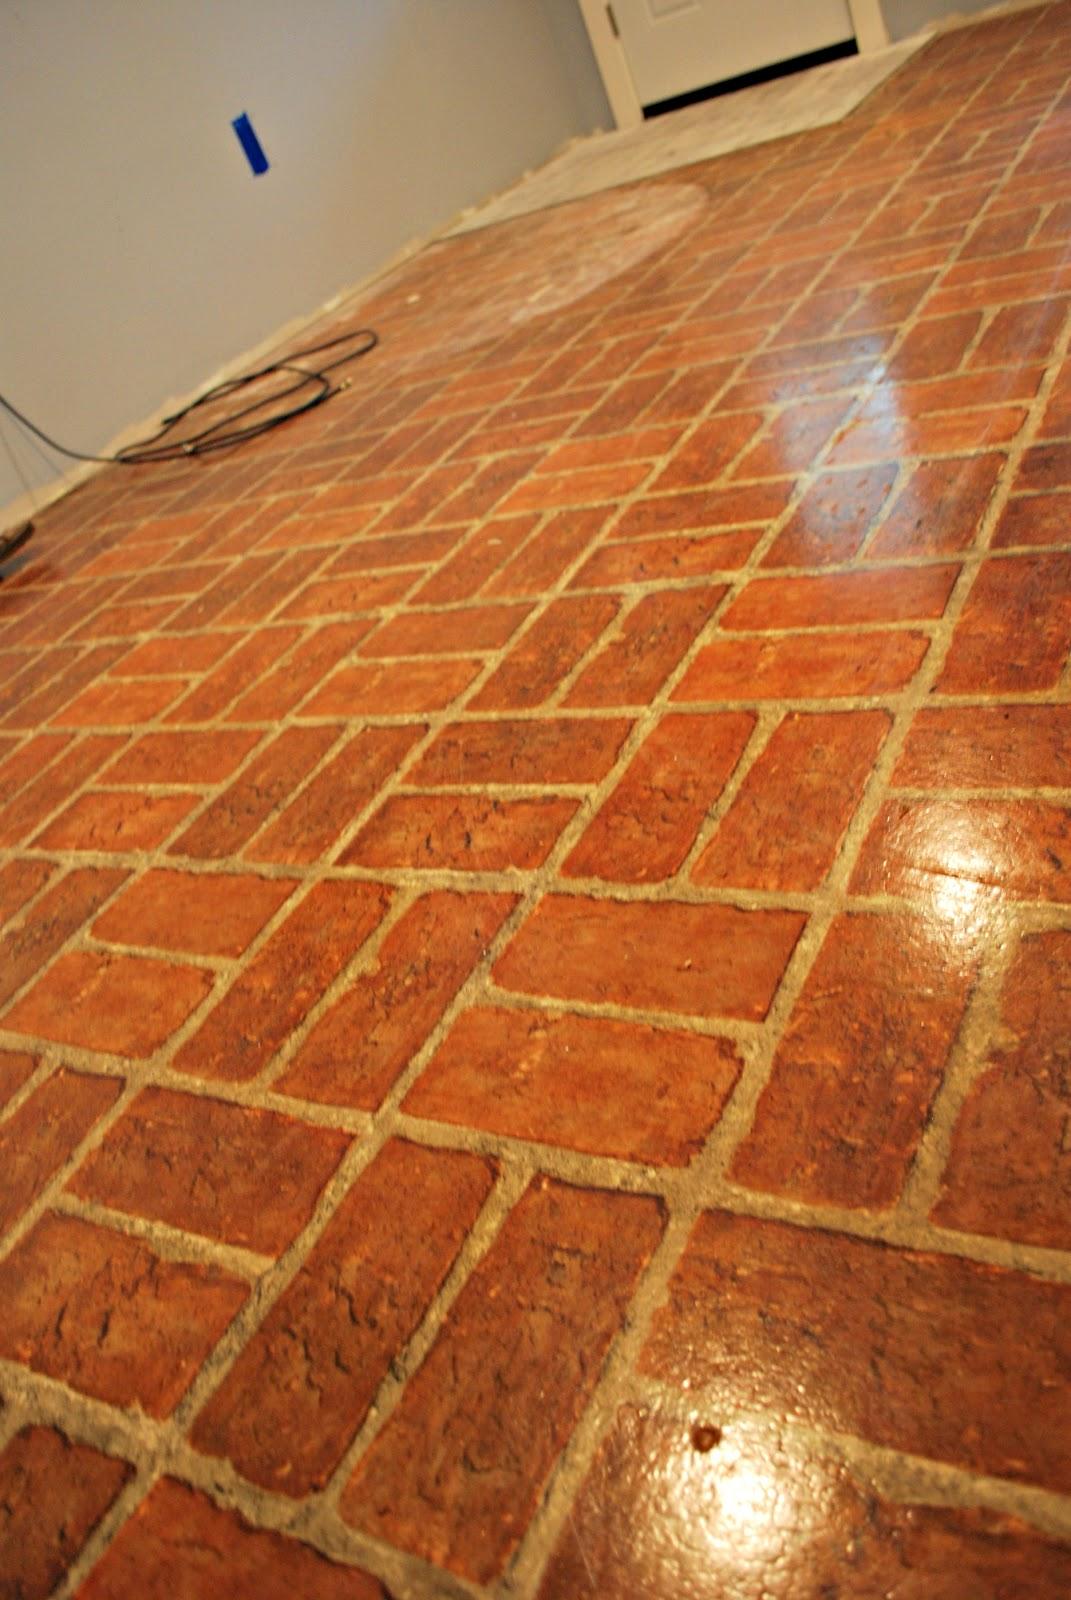 Brick style vinyl flooring flooring ideas and inspiration photo tivoli tile vinyl floor tiles images self adhesive dailygadgetfo Image collections